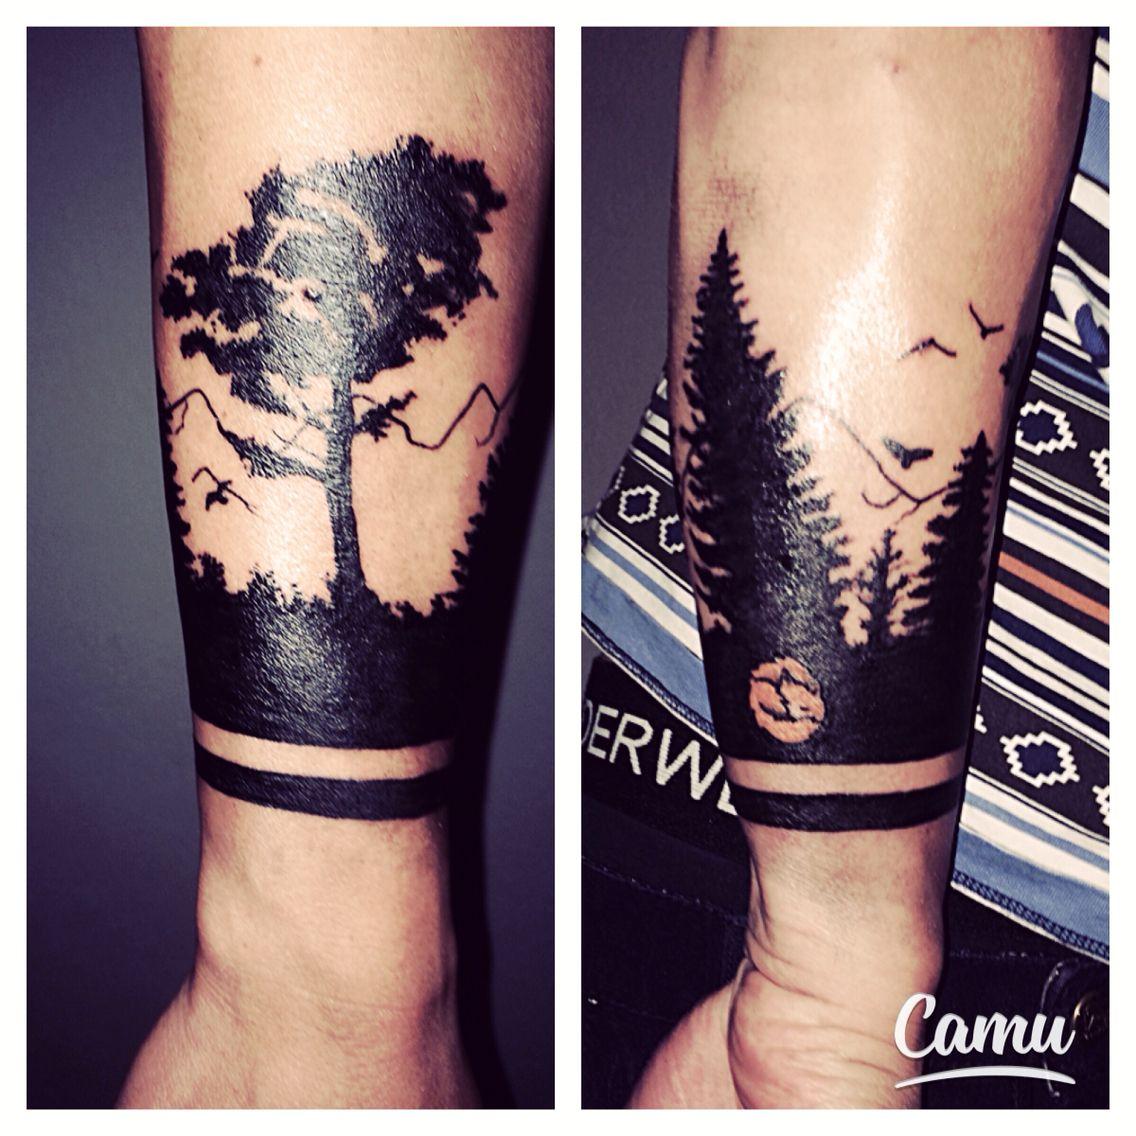 Tatouage Foret Graphique Noir Avant Bras Tatouages Tattoos Tatt